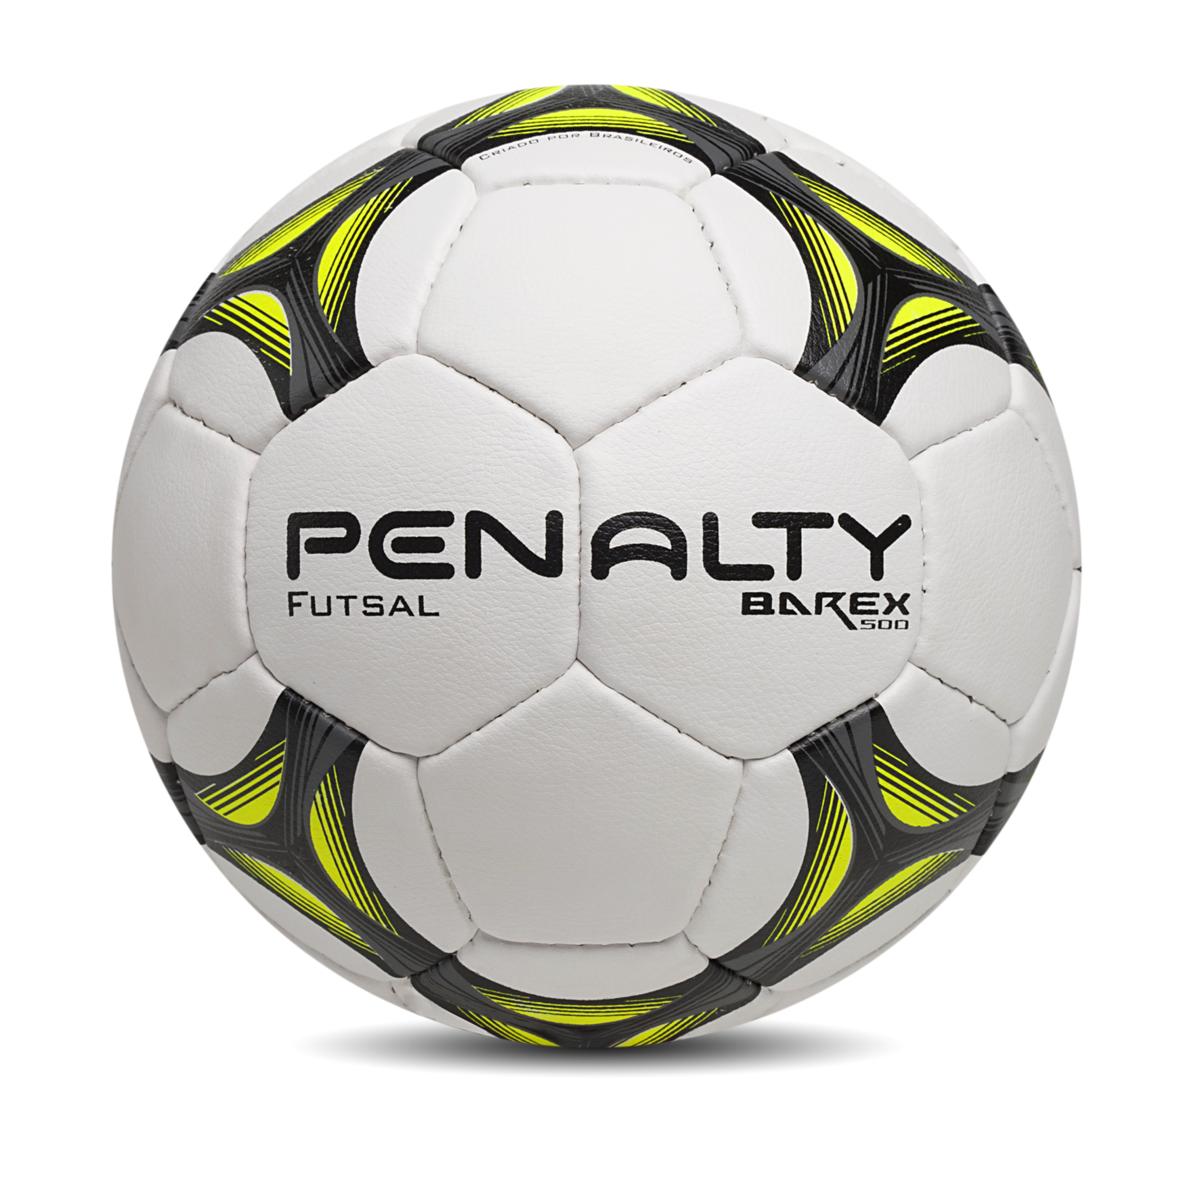 Bola futsal penalty barex branco verde limão jpg 1200x1200 Bola imagens de  futebol salao be308b3b8f4ca